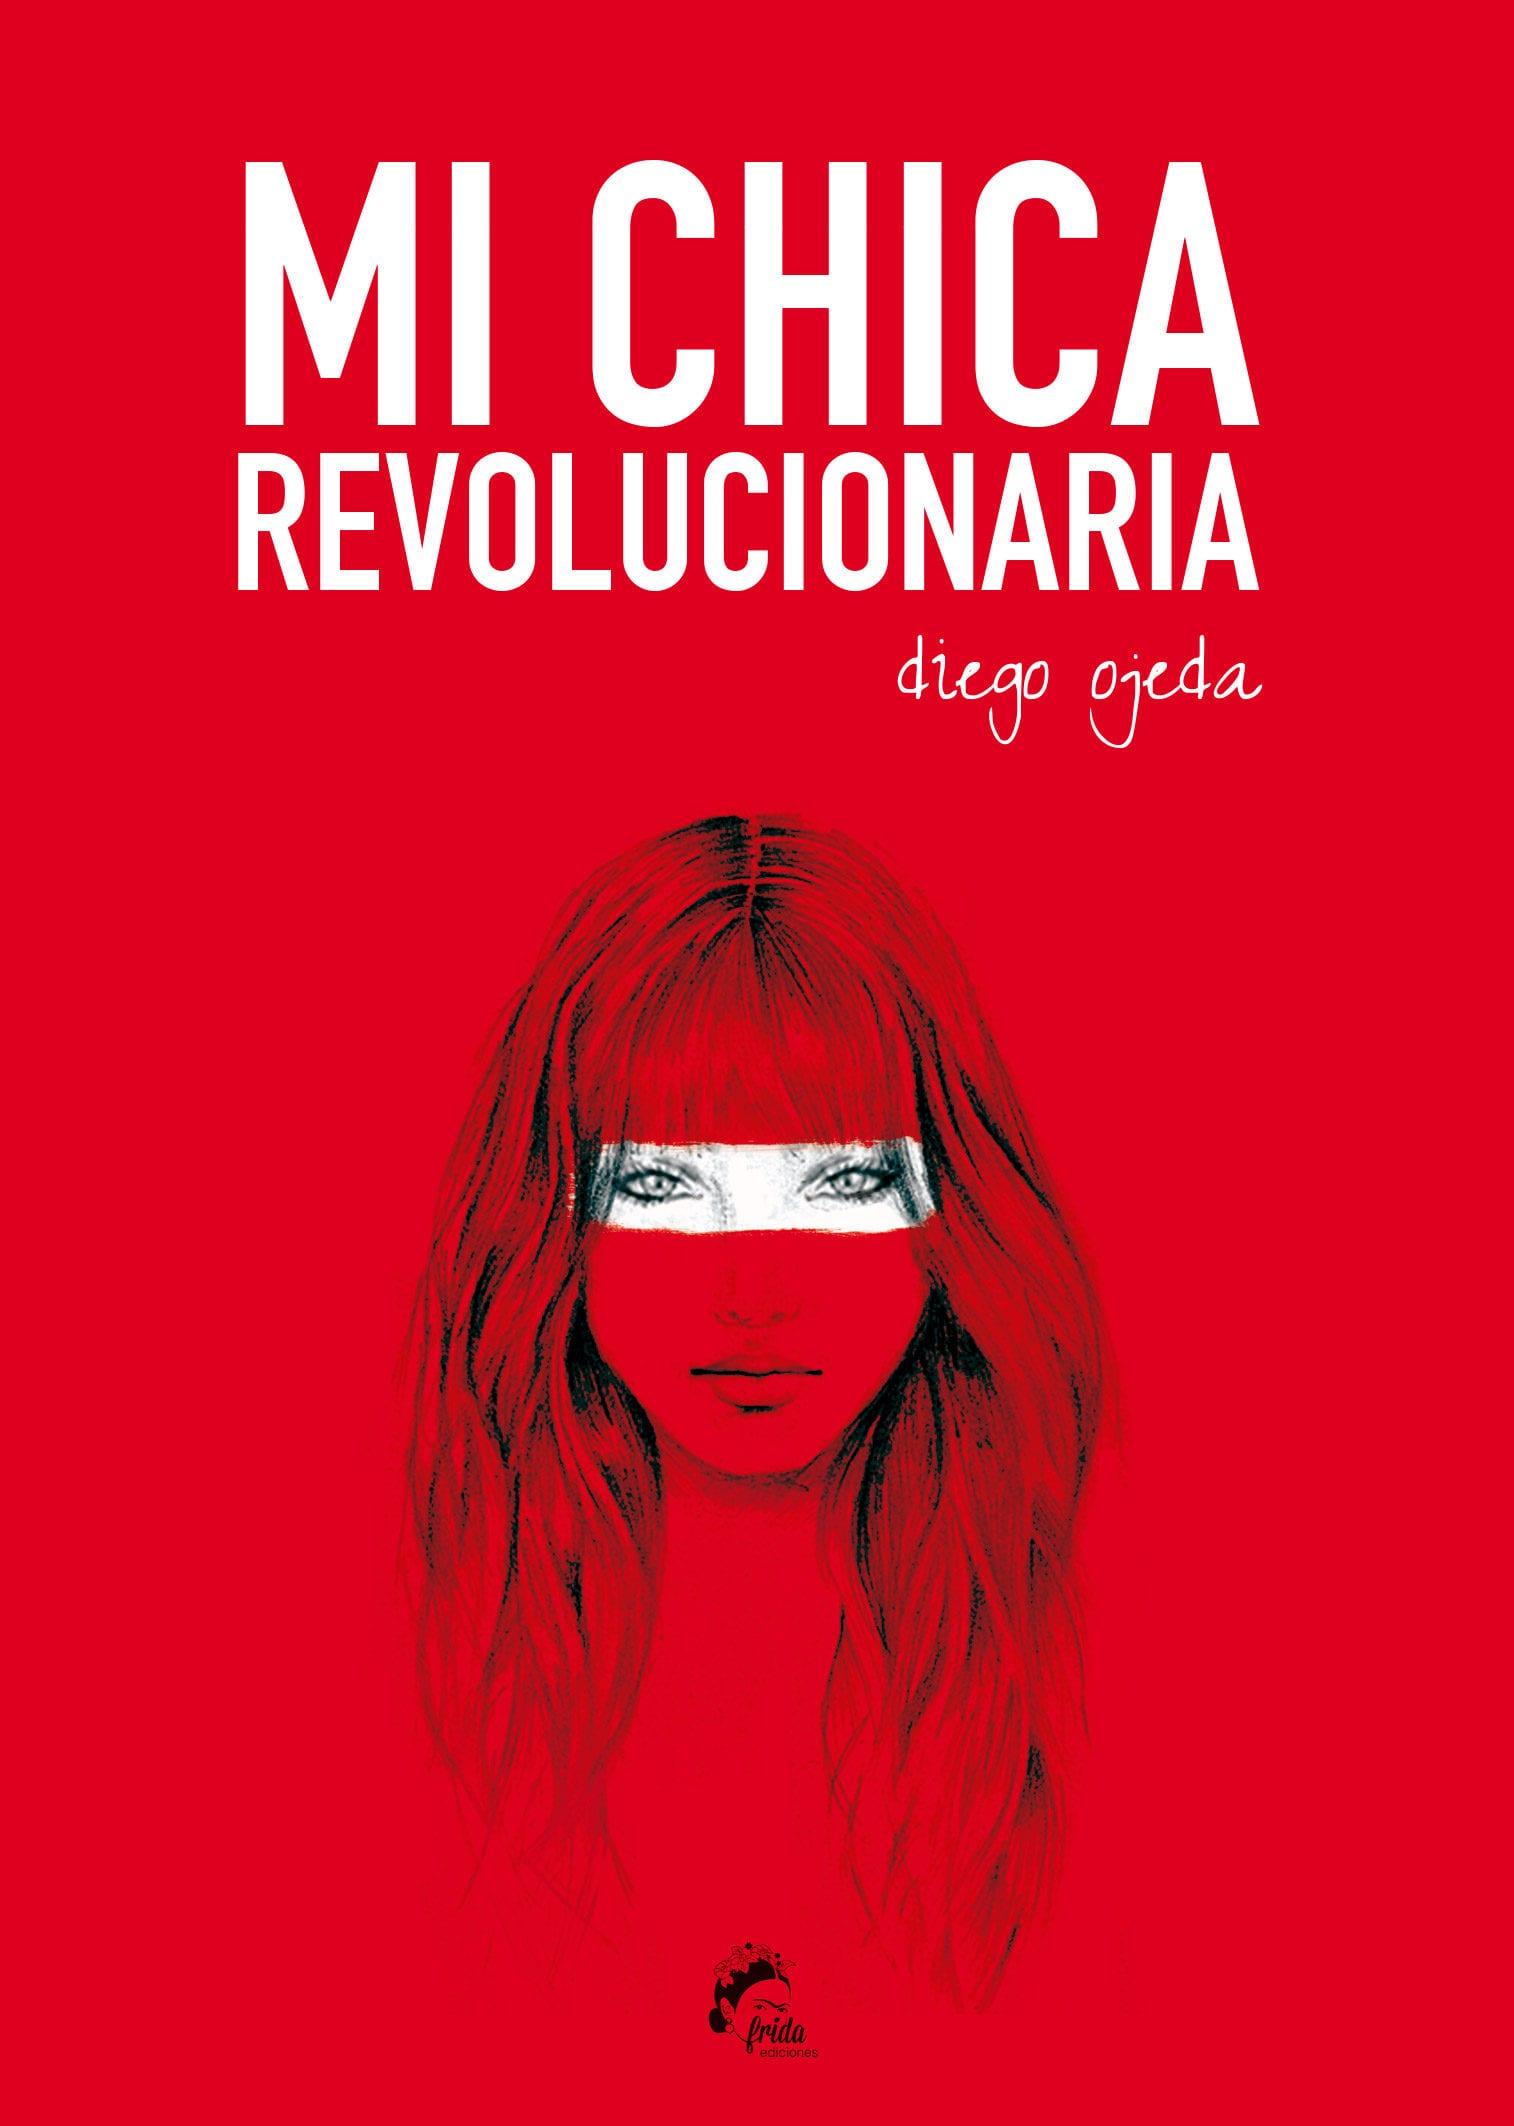 Mi chica revolucionaria, de Diego Ojeda - Reseña